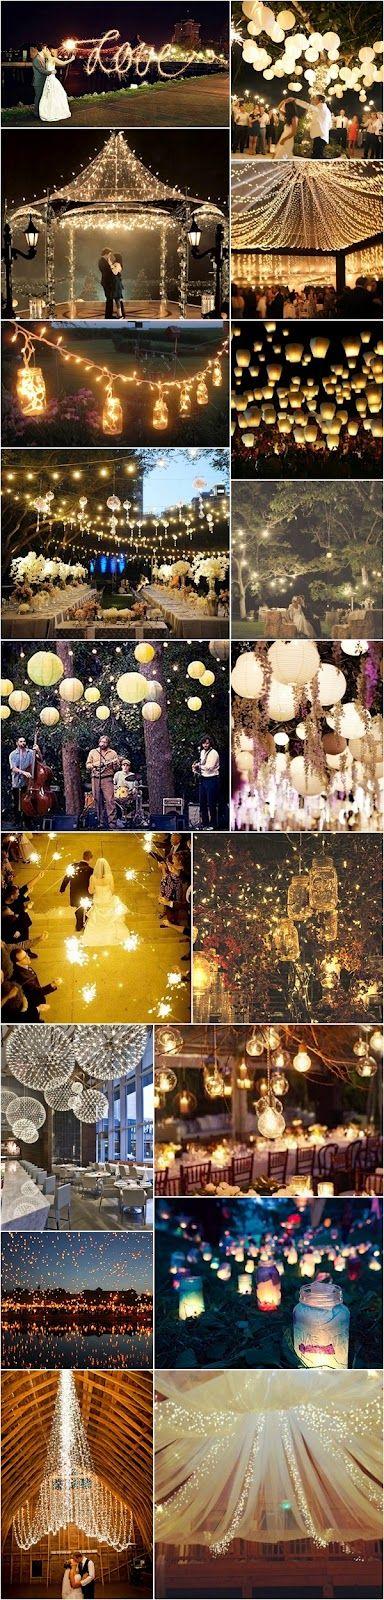 Comodoos Interiores -Tu blog de Decoracion-: Ideas para iluminar tu ceremonia